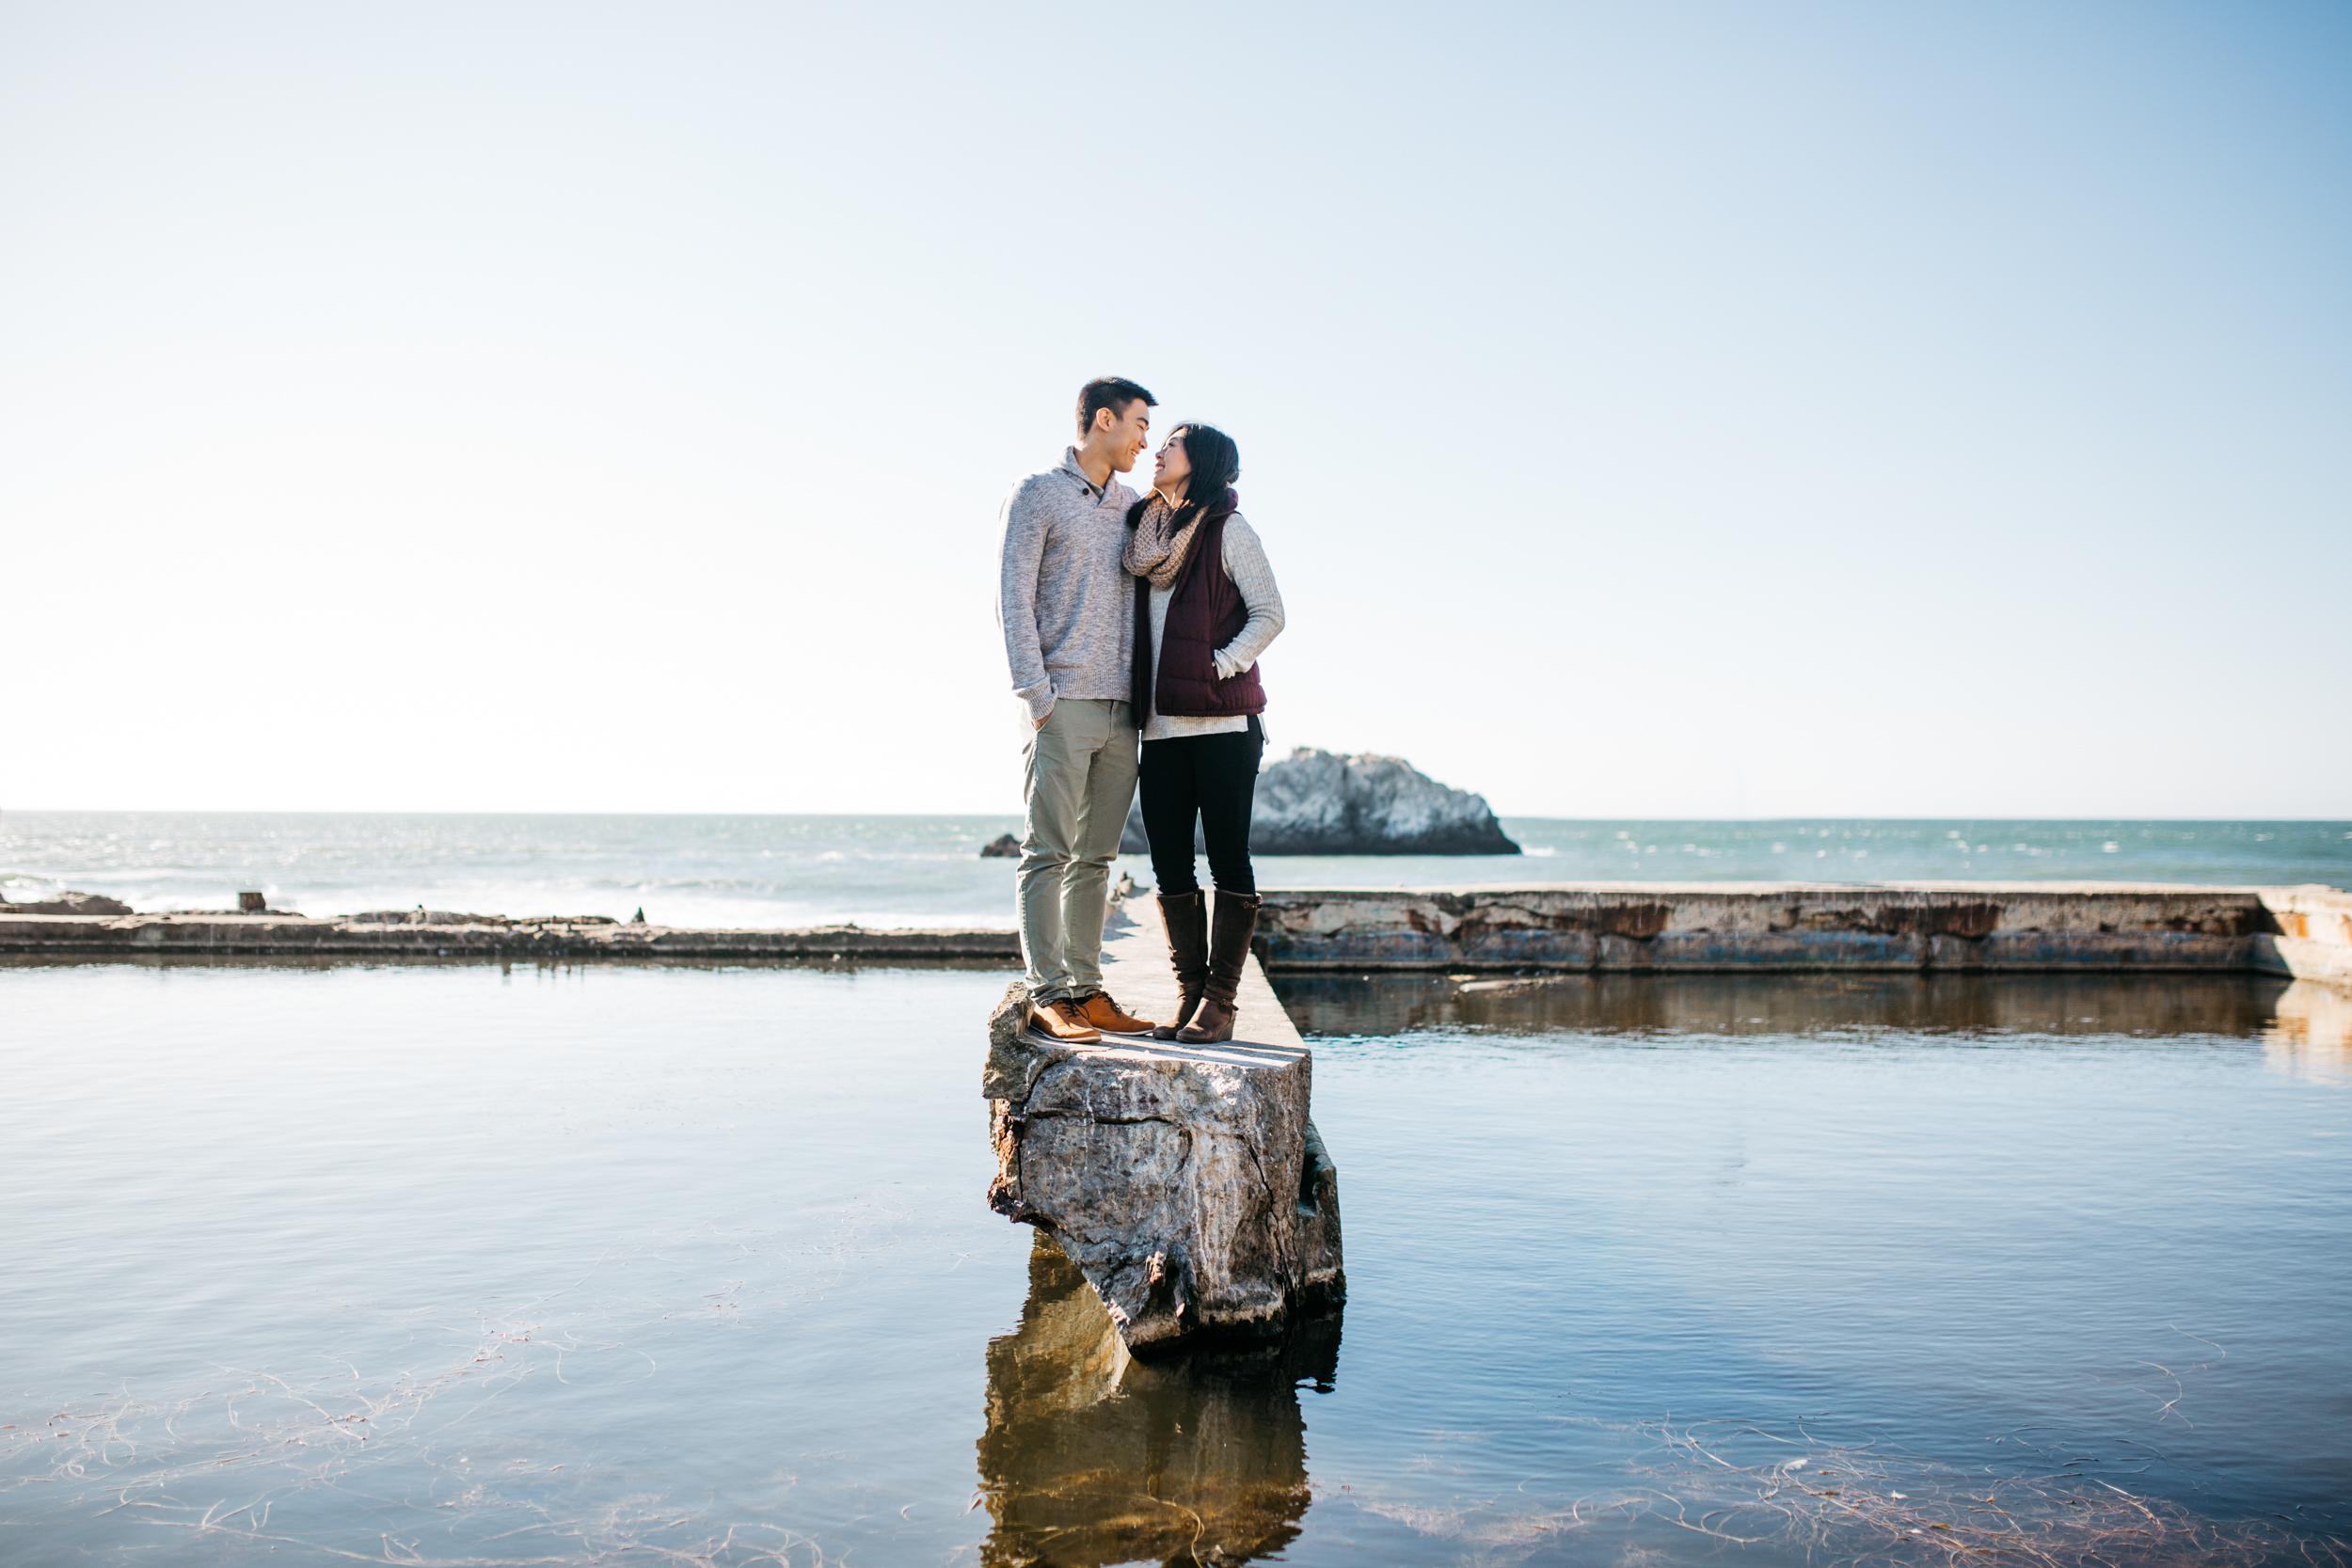 Engagement Photos-Ranalla Photo and Films-20.jpg